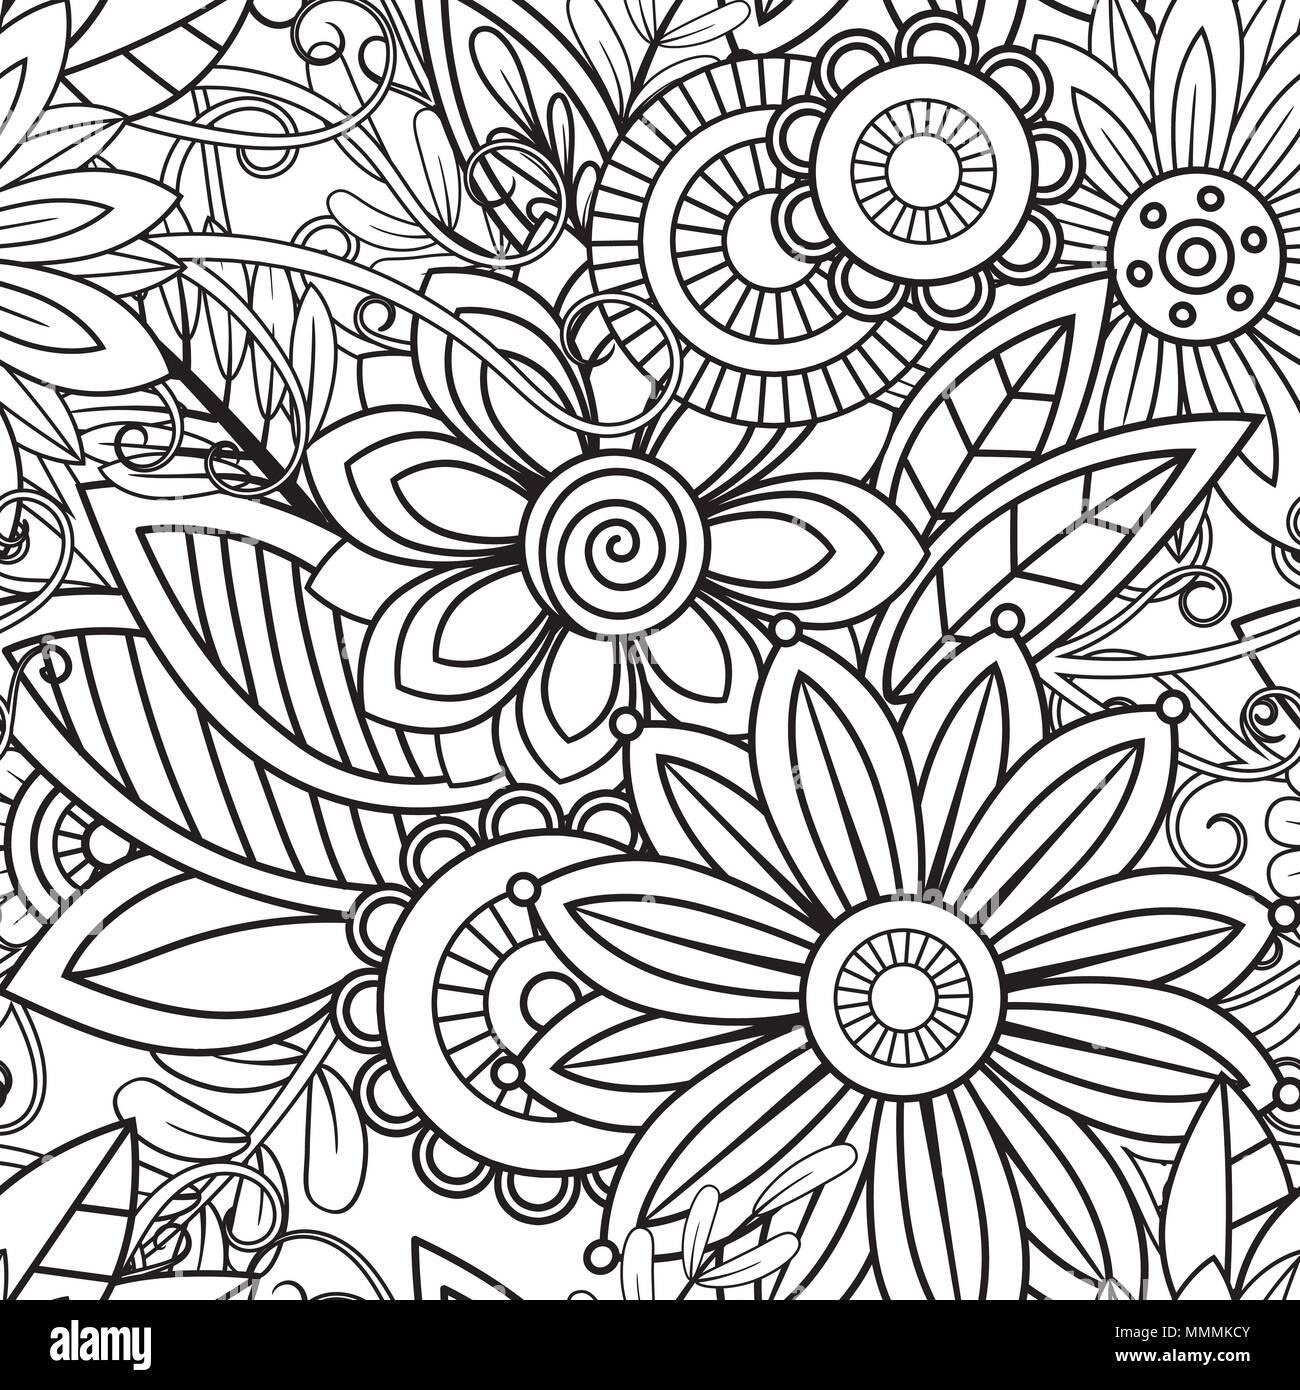 Colouring Page Imágenes De Stock & Colouring Page Fotos De Stock - Alamy